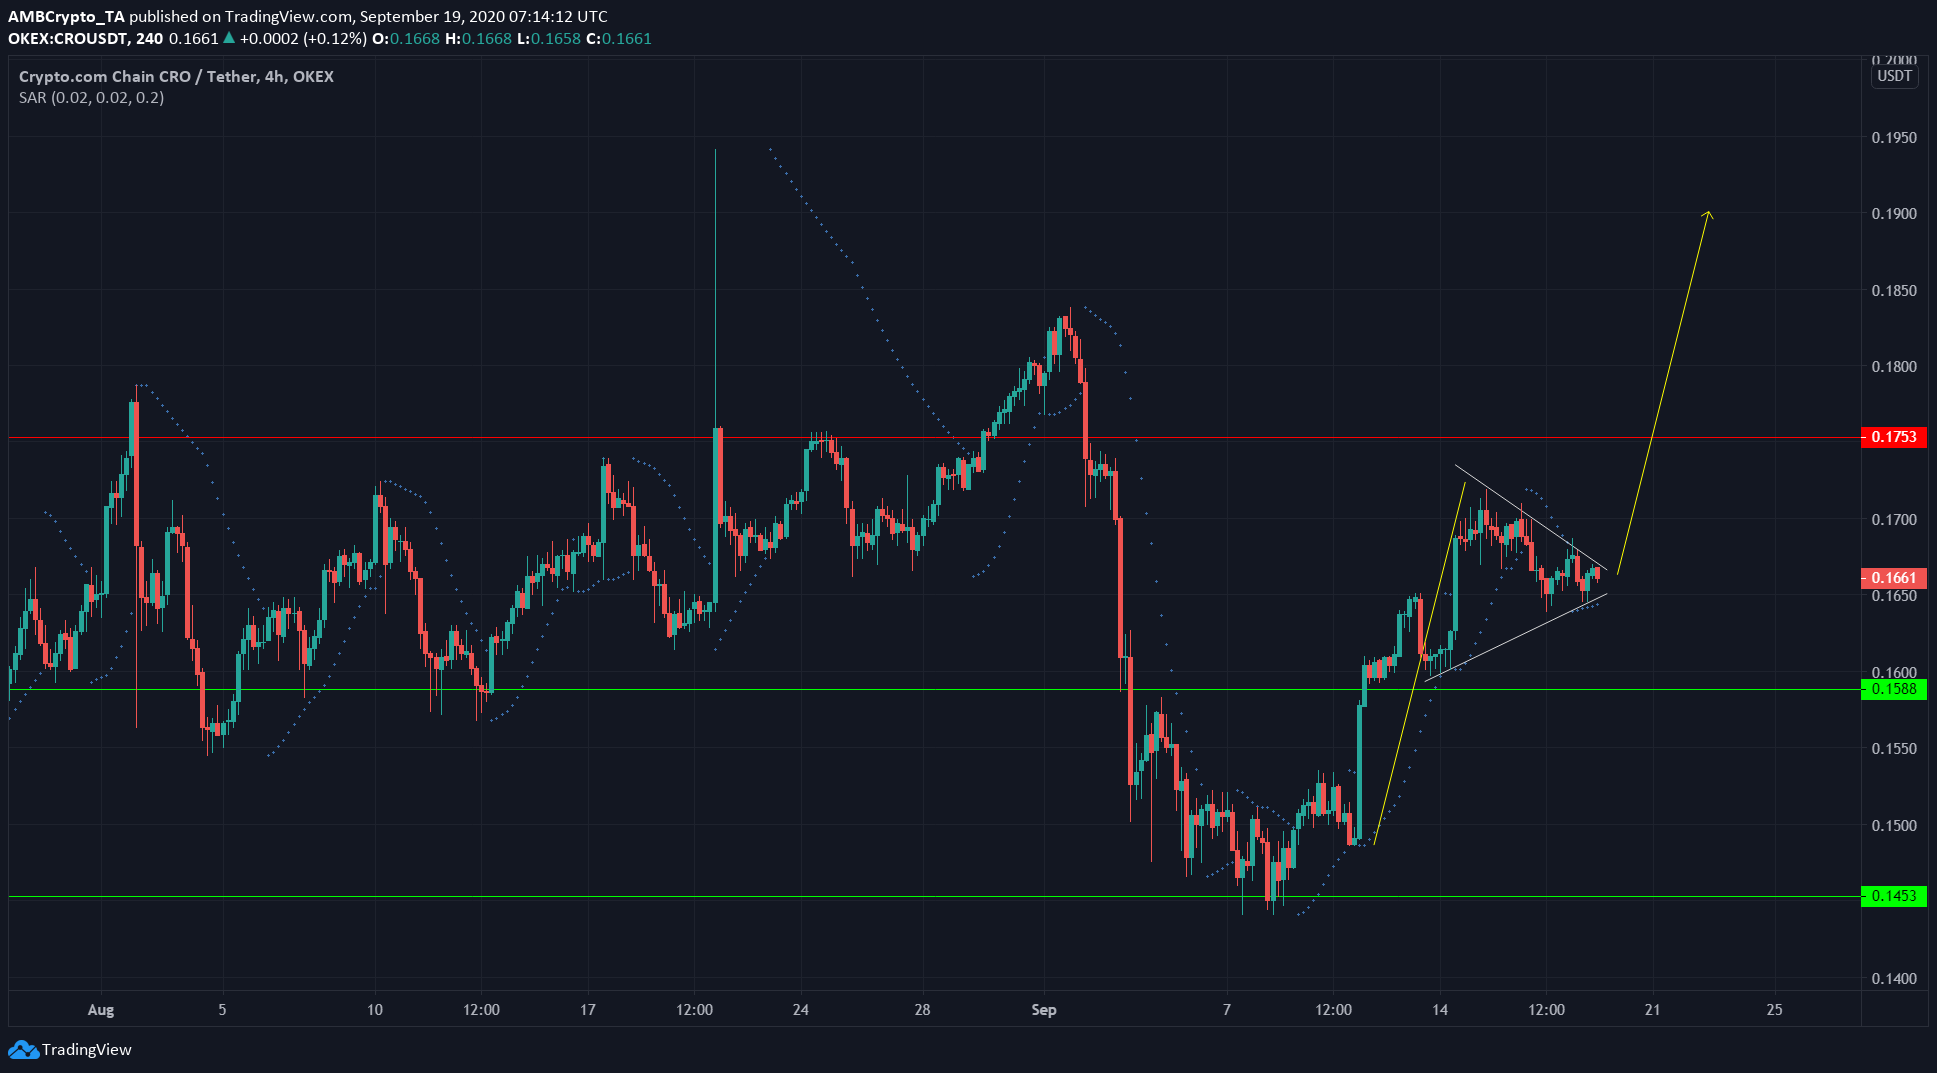 Cardano, Ontology, Crypto.com Coin Price Analysis: 19 September